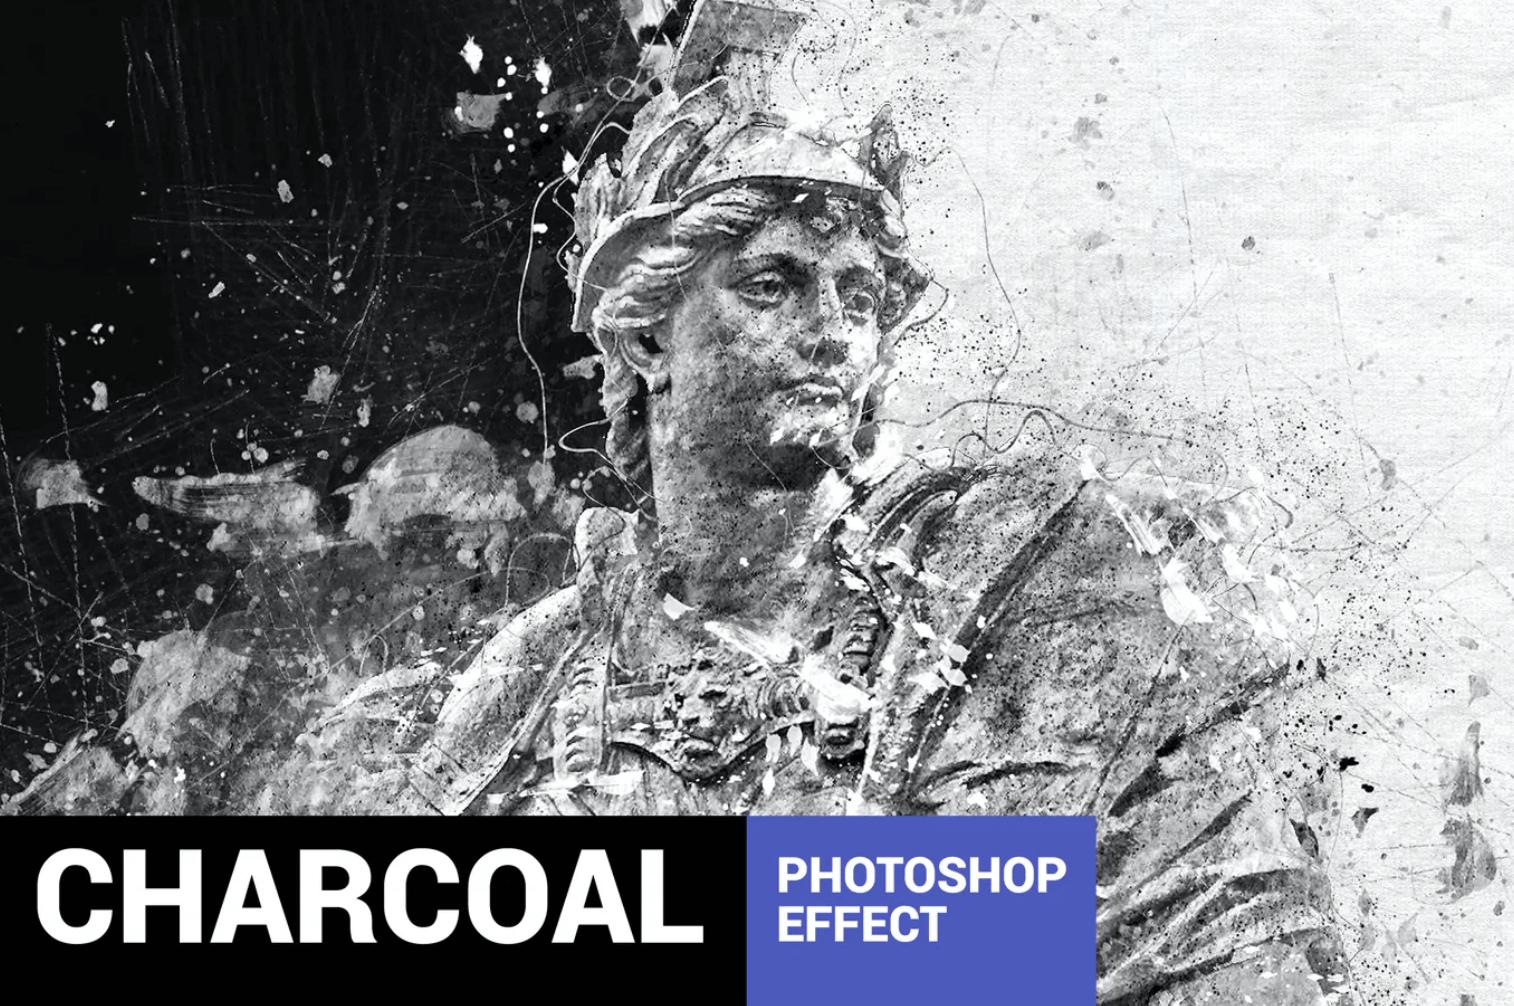 Graphitum-木炭素描Photoshop动作